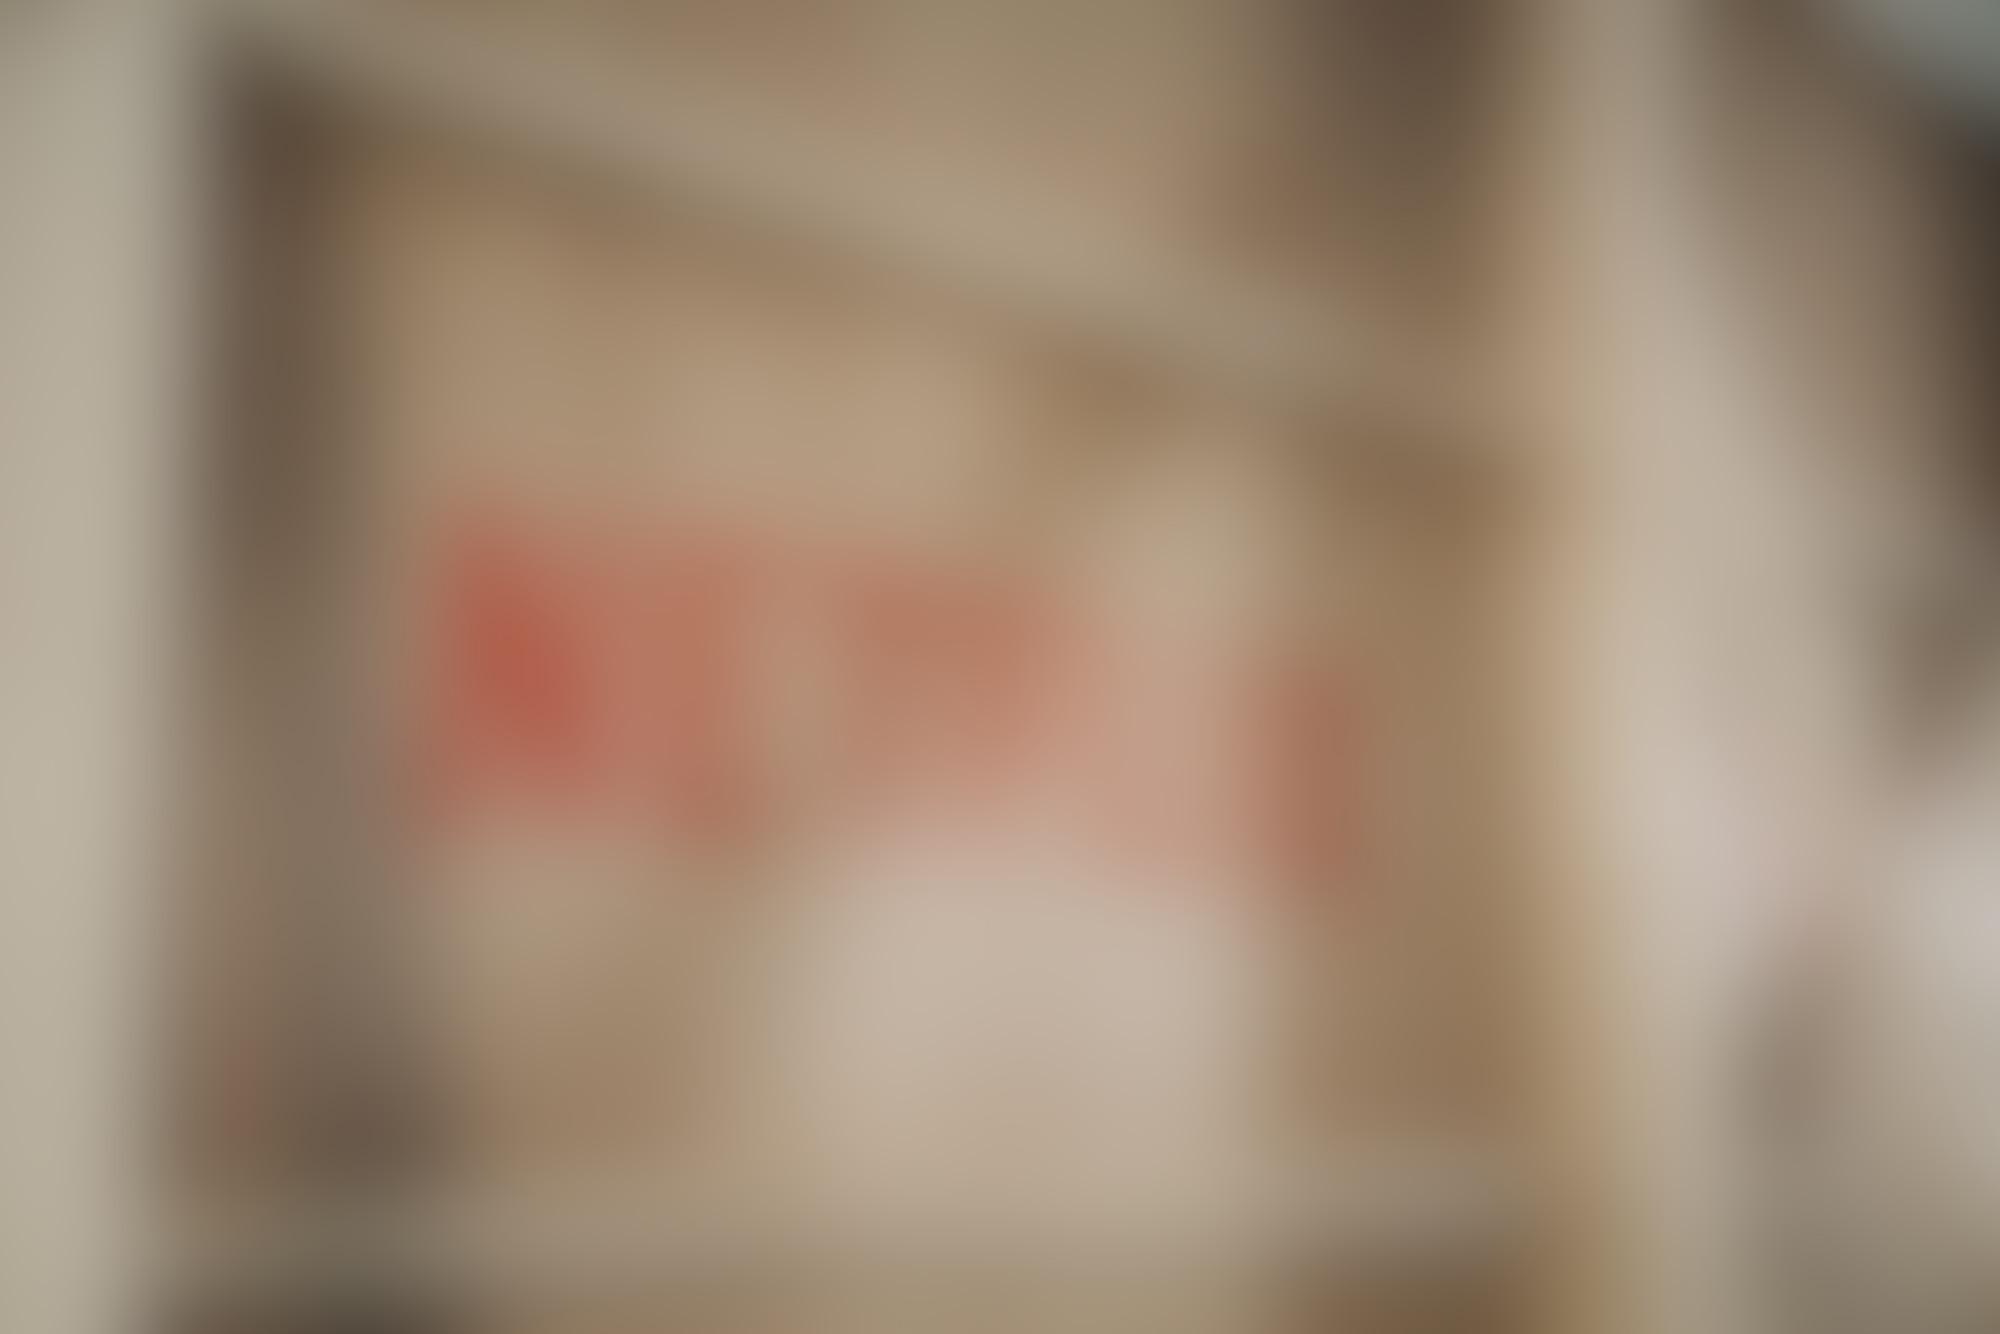 Lord Whitney Netflix Experience Arndale Luke Fullalove 2 2 autocompressfitresizeixlibphp 1 1 0max h2000max w3 D2000q80sc5d71017095f0e00a5f790dcf92fea3d